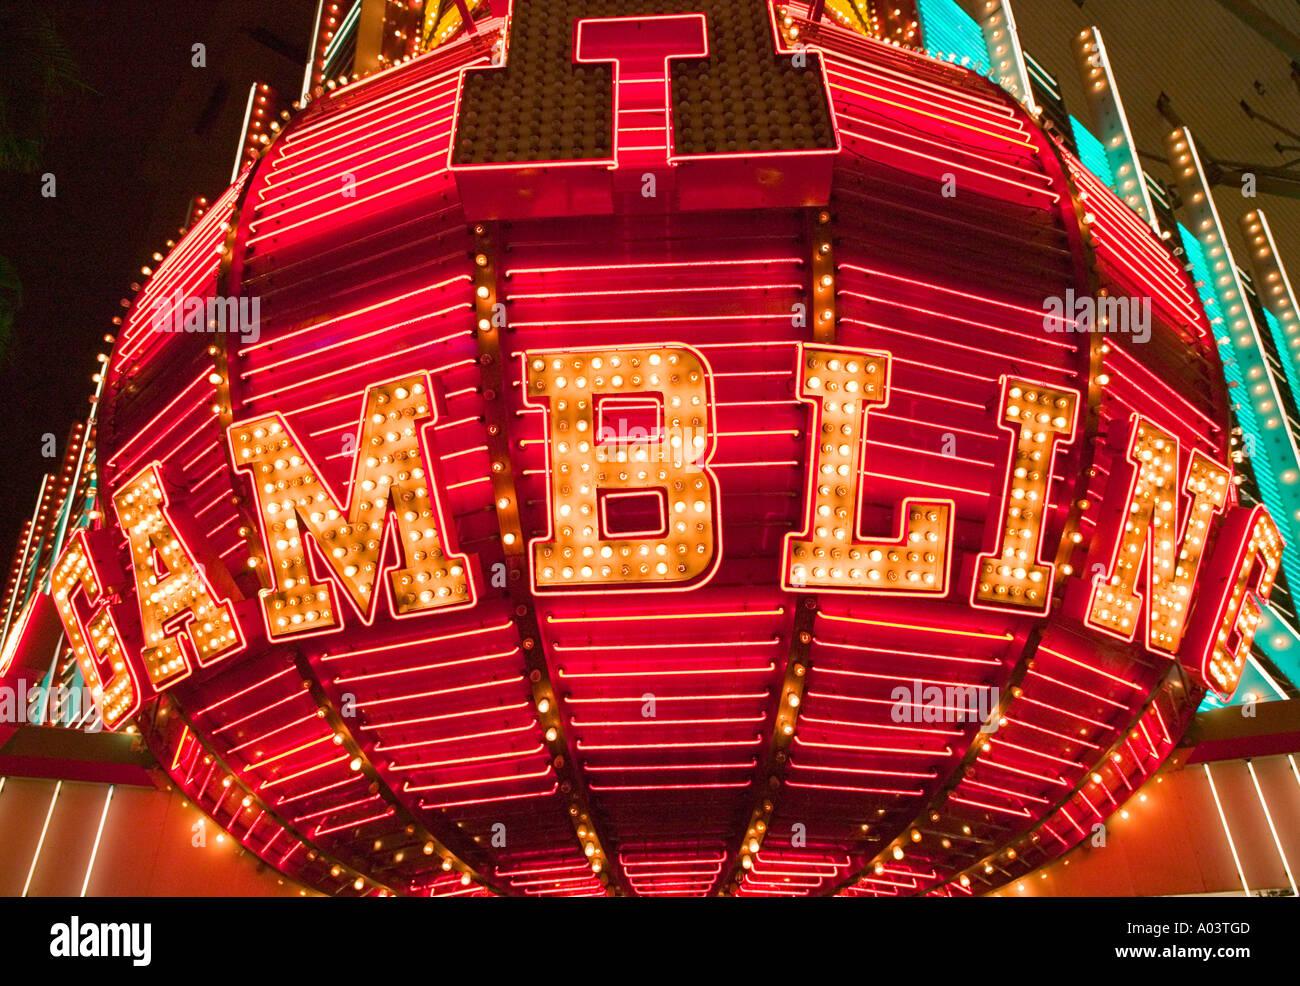 Search horseshoe casino cosmopolitan resort casino condos